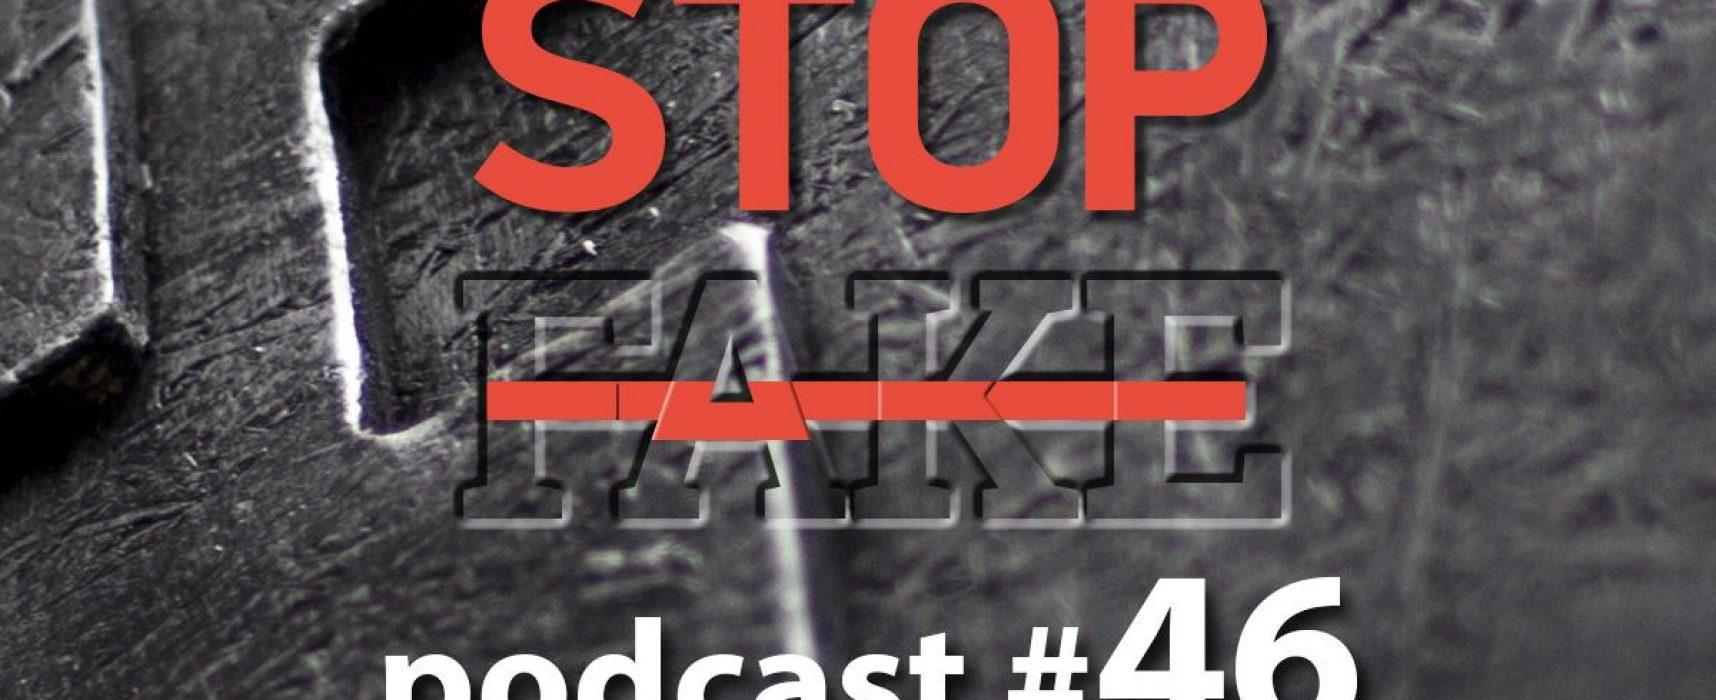 StopFake podcast #46